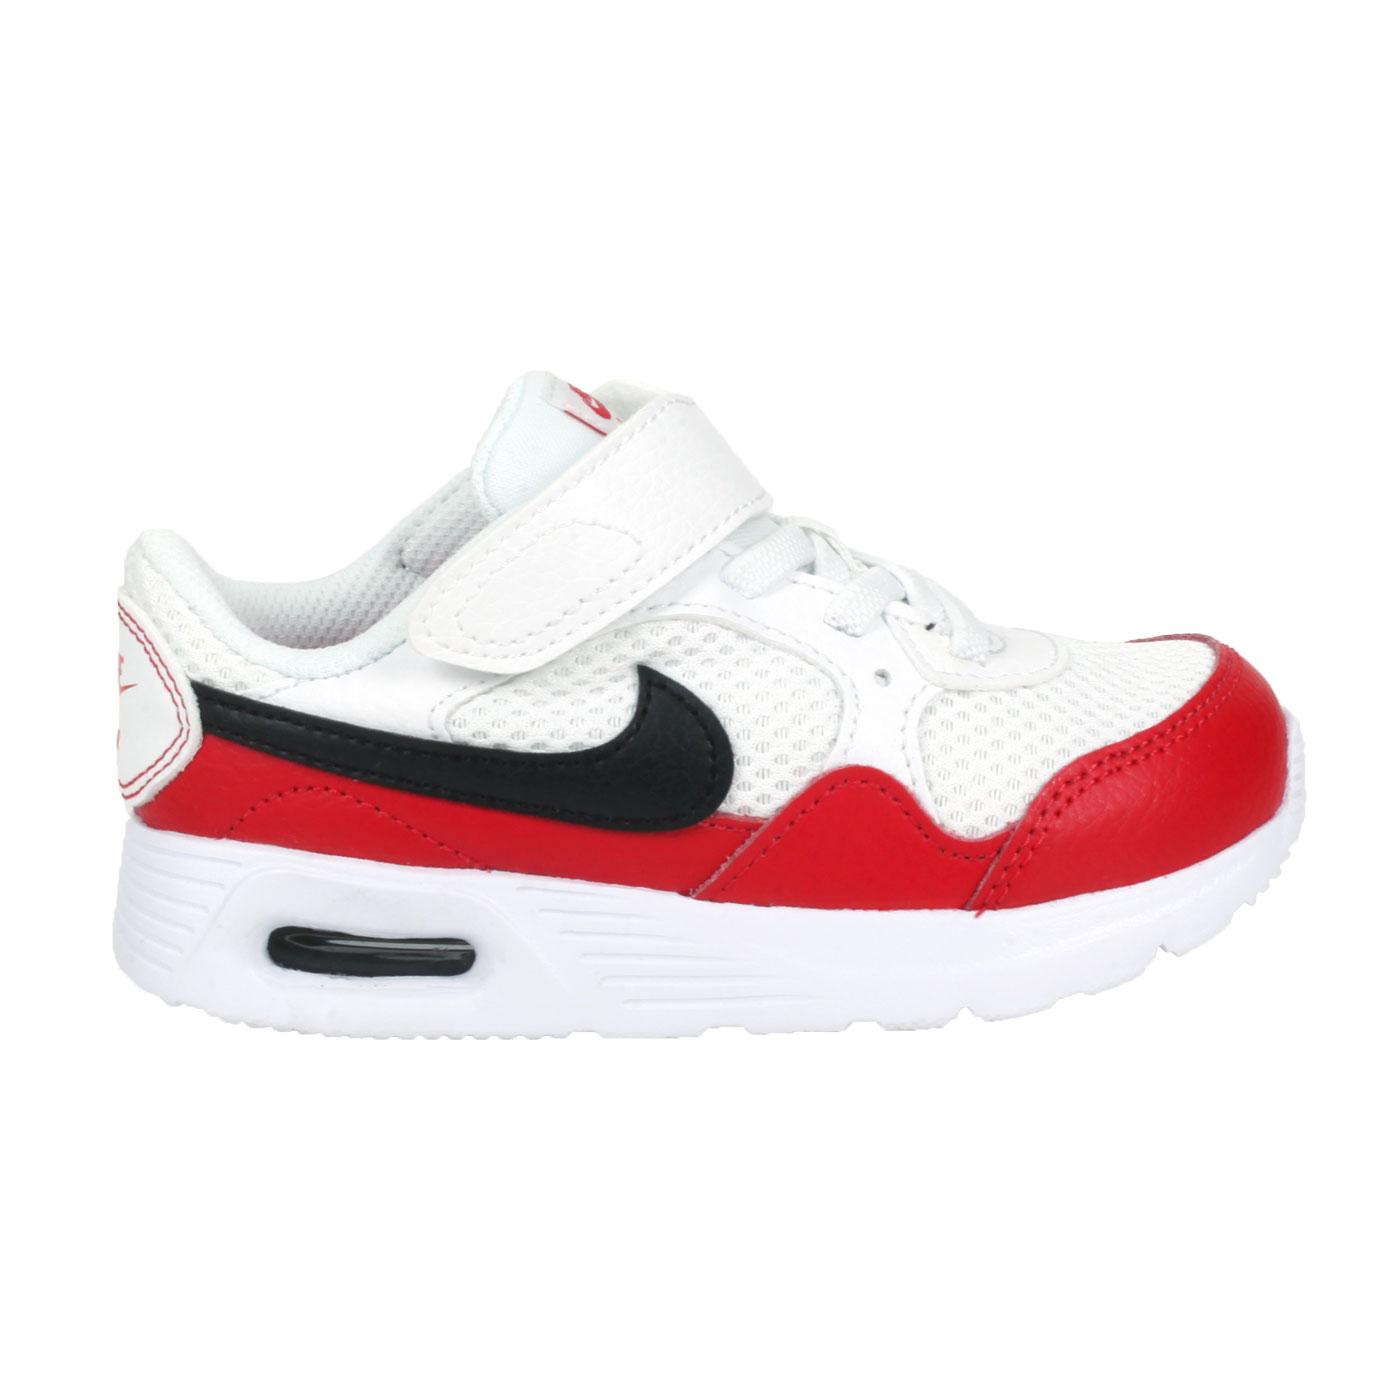 NIKE 小童休閒鞋  @AIR MAX SC(TDV)@CZ5361106